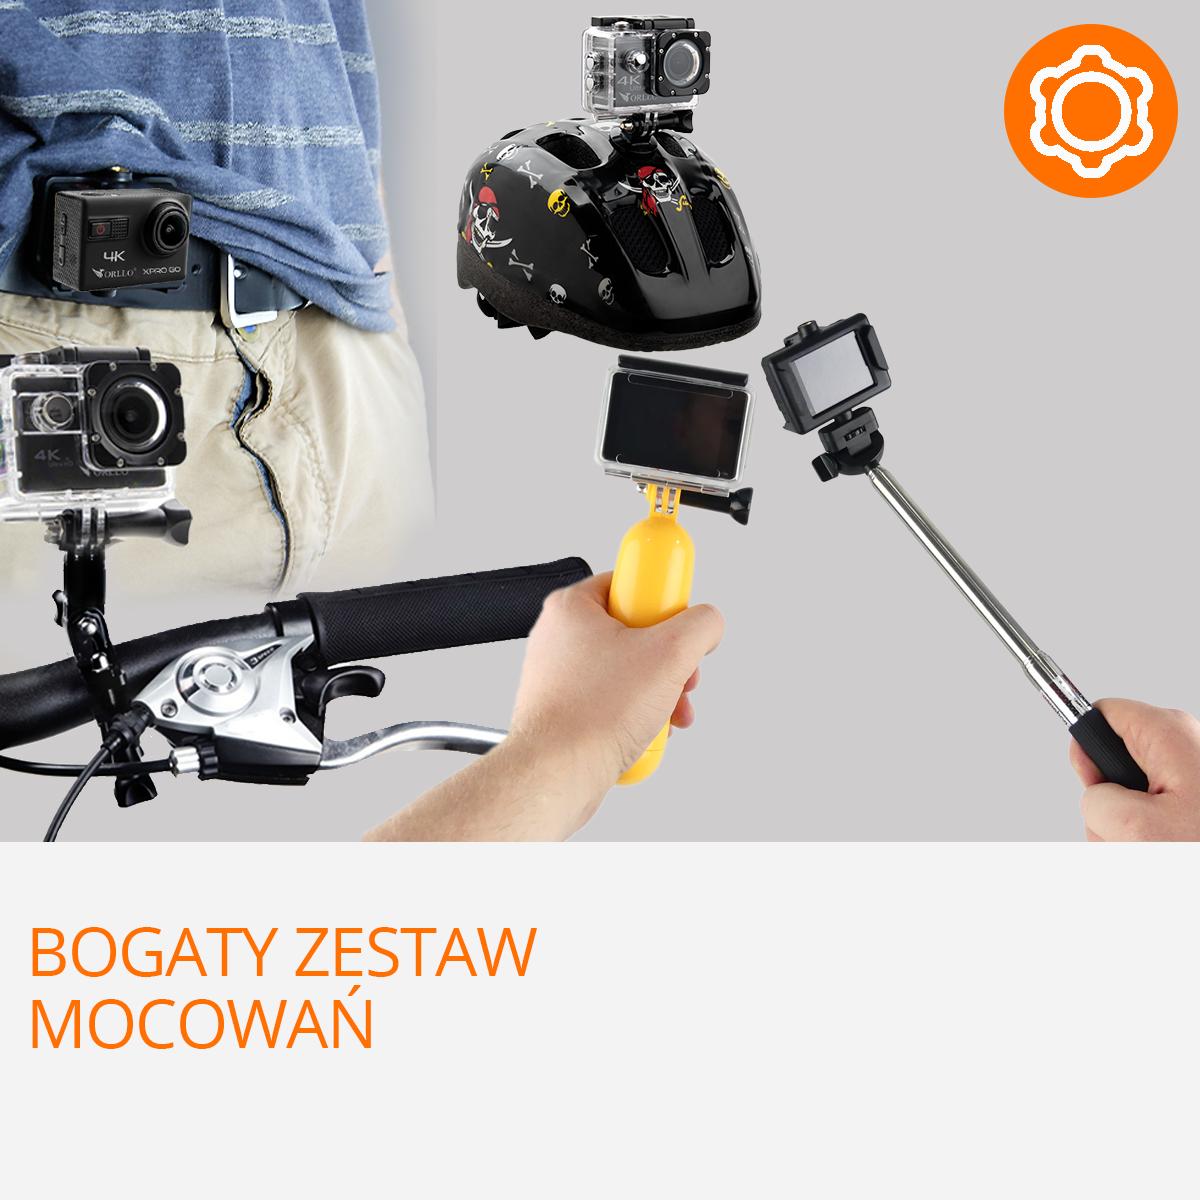 Kamera sportowa mocowania orllo pl